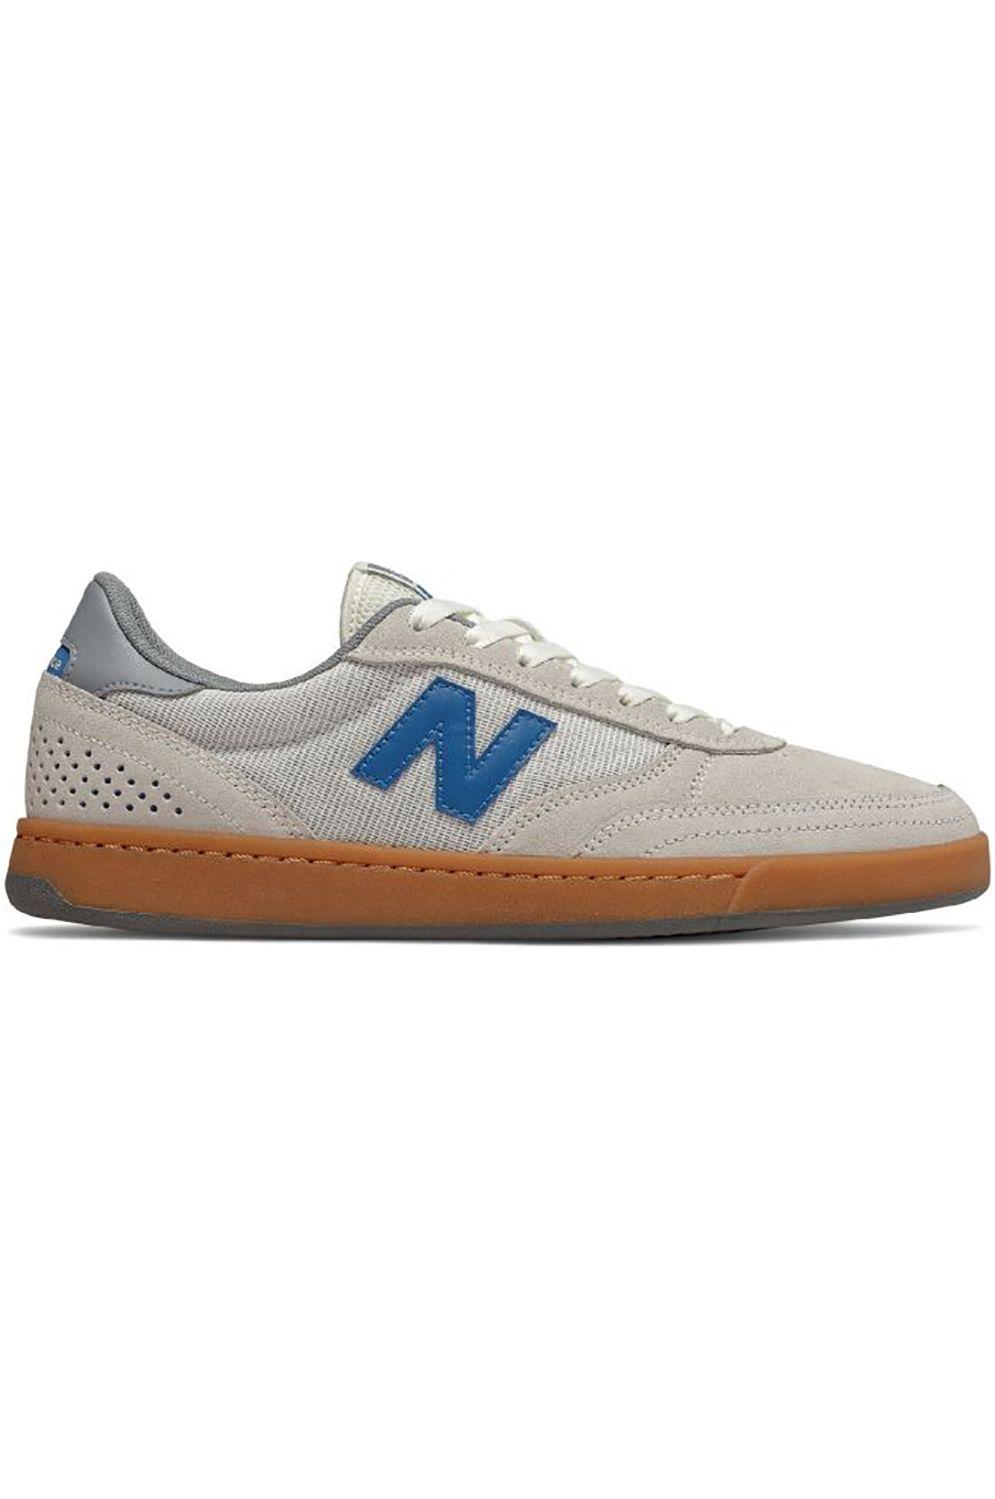 New Balance Shoes NM440 Sea Salt